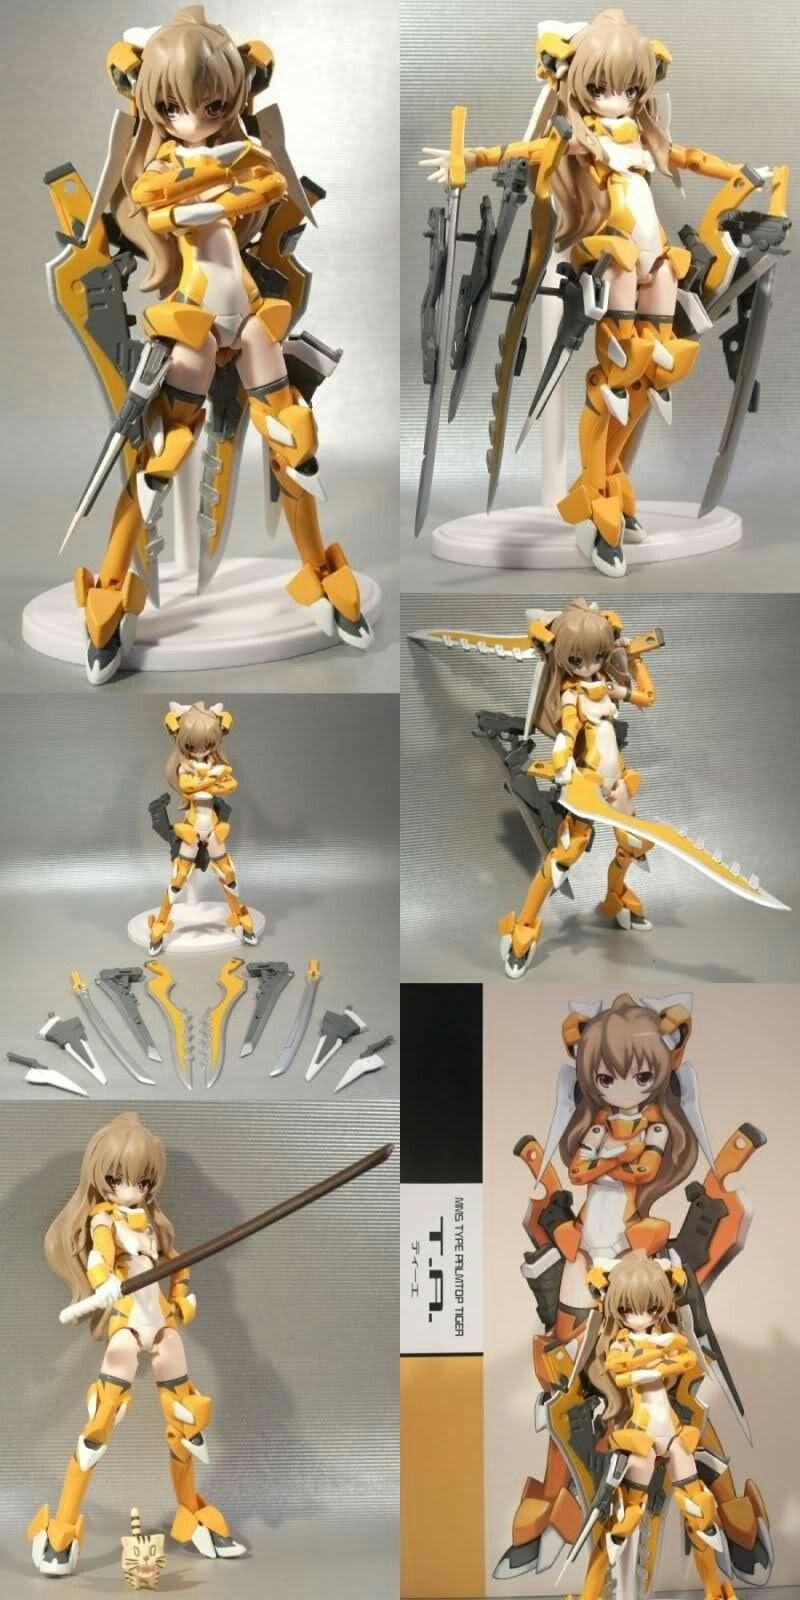 Aisaka taiga Toradora, Frame arms girl, Anime figures